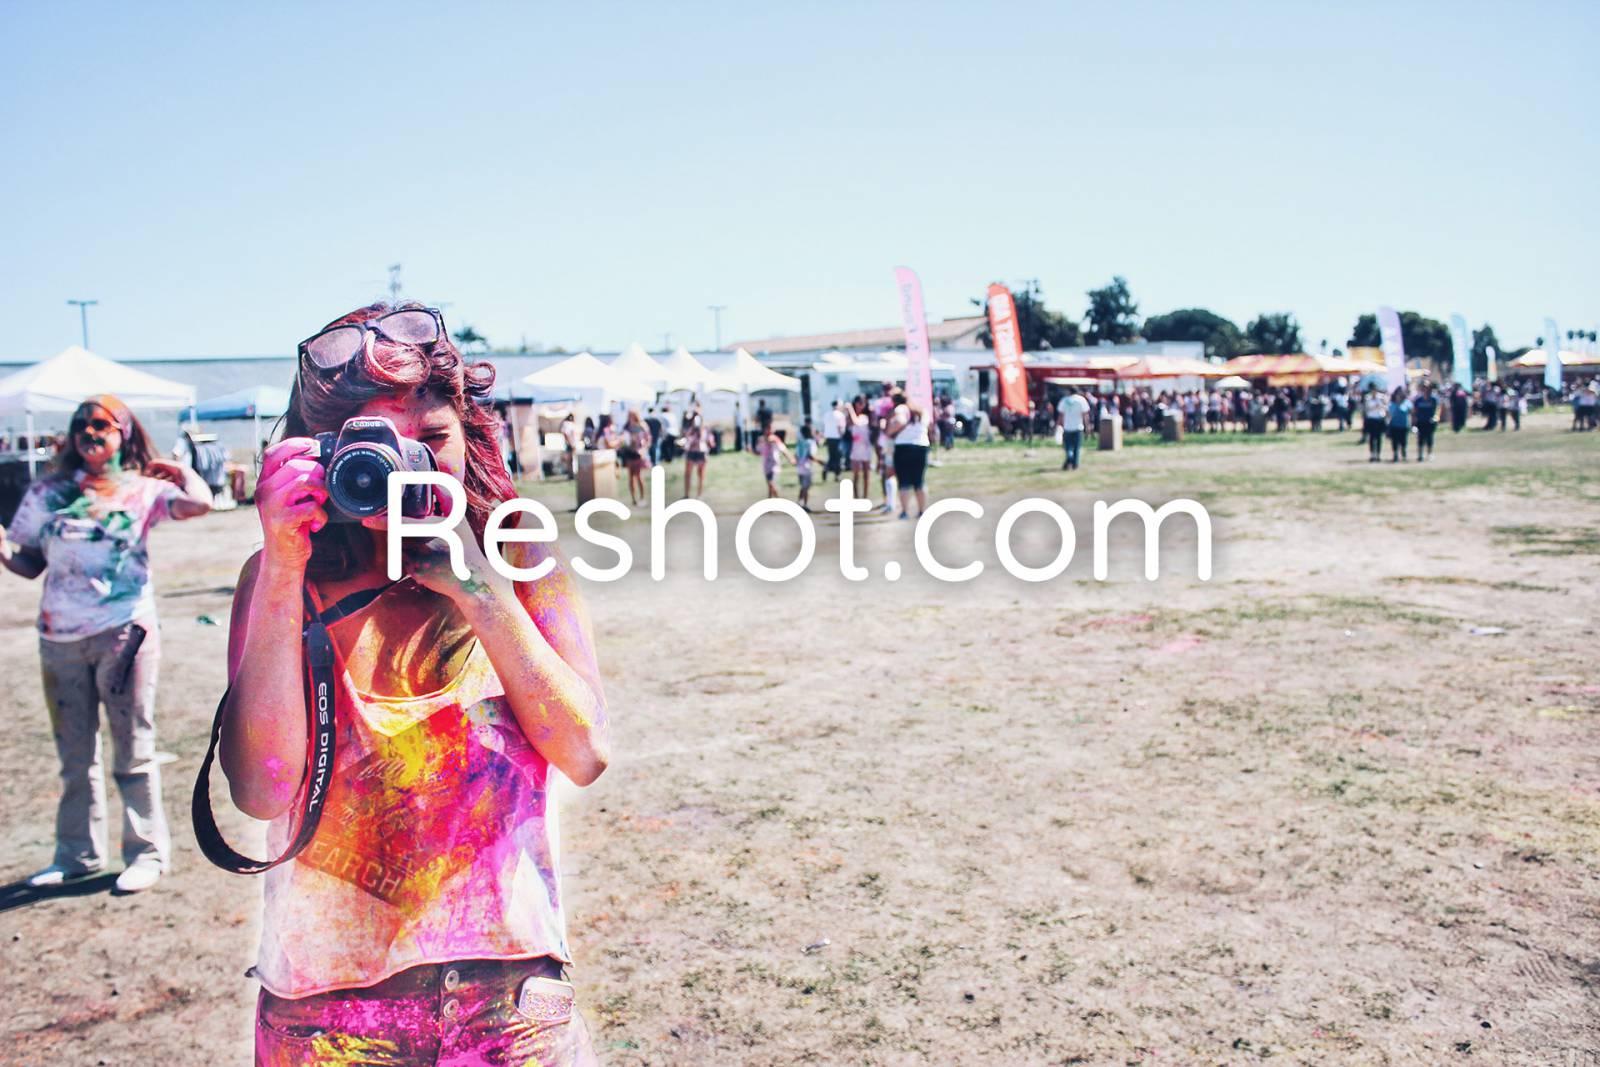 reshot gratis stockfoto's